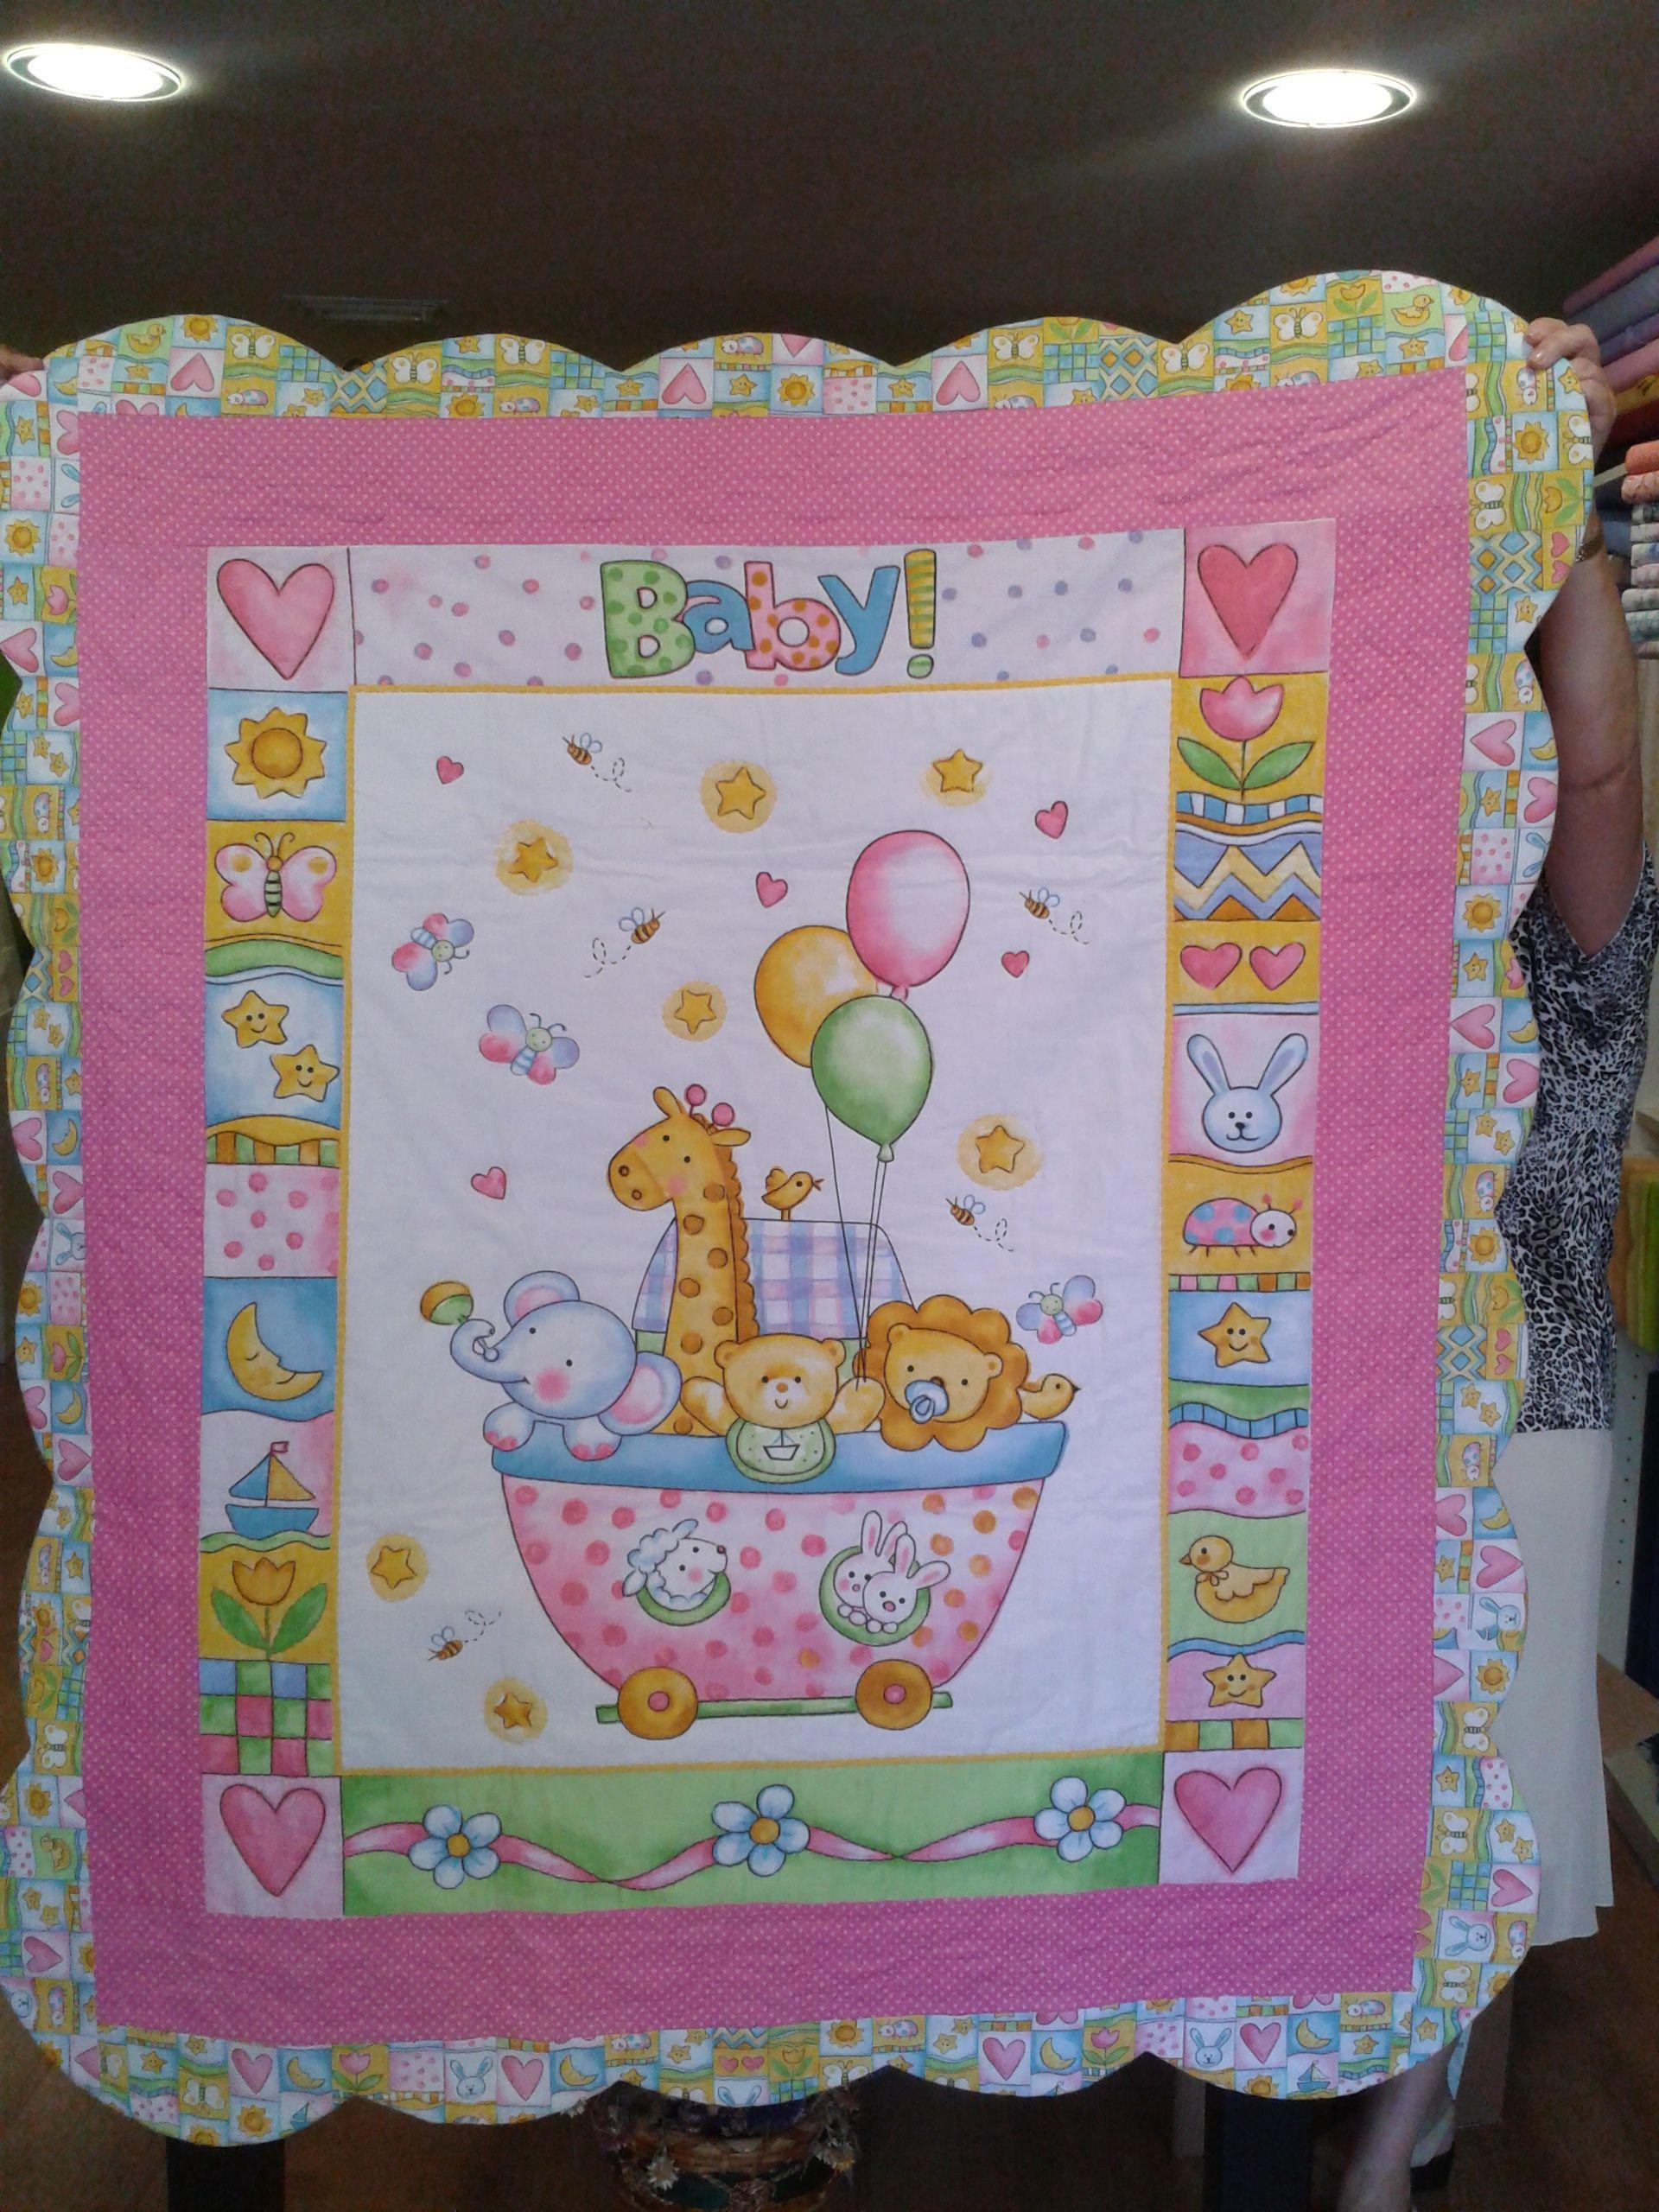 Colcha bebe edredones bebes pinterest colchas bebe - Patrones colcha patchwork ...